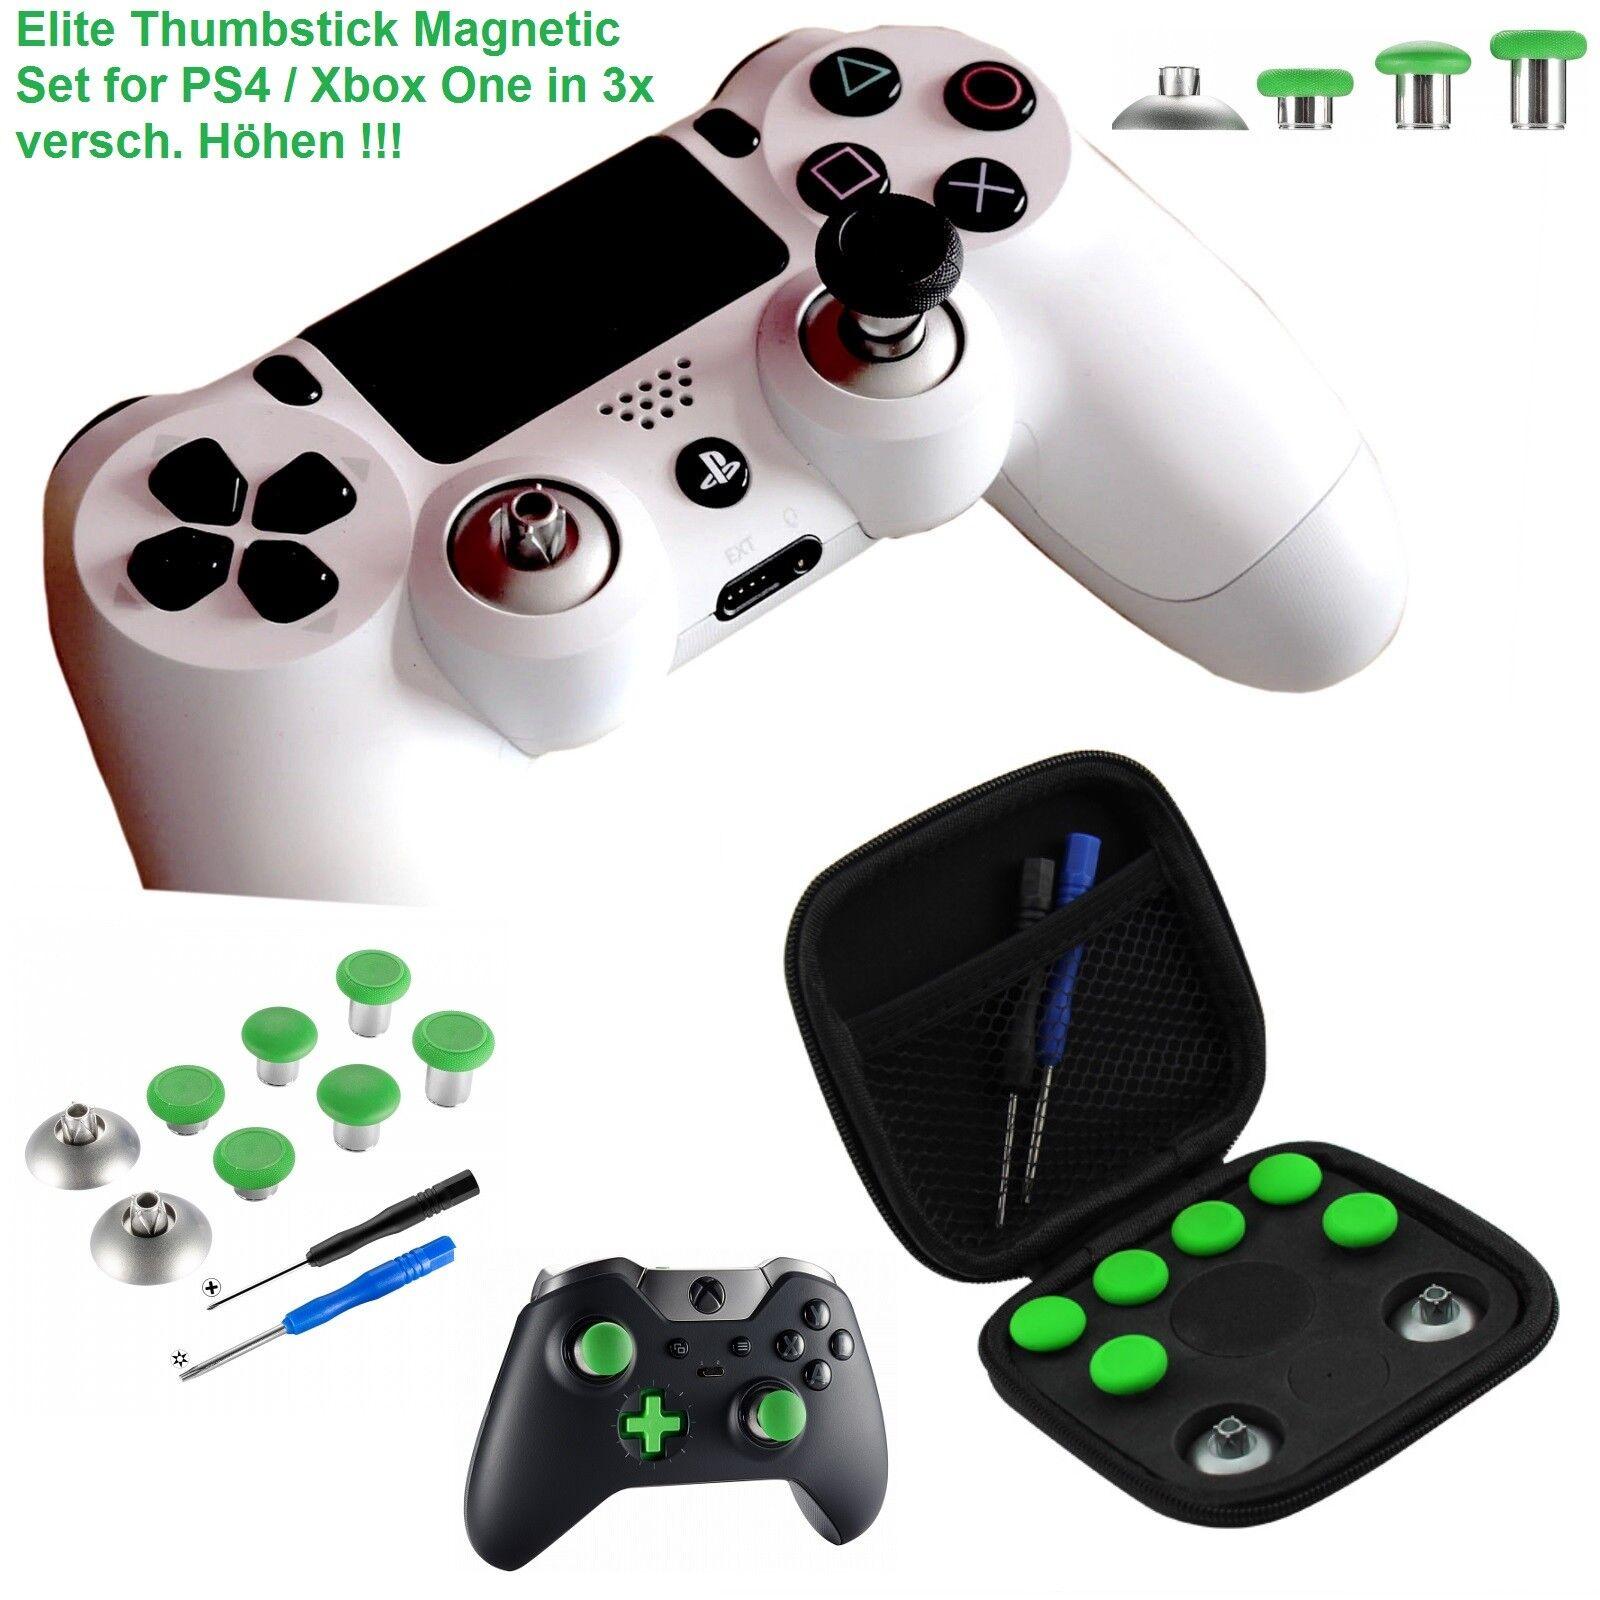 Elite Thumbstick Modding Set PS4 & Xbox 1 Controller Magnetic